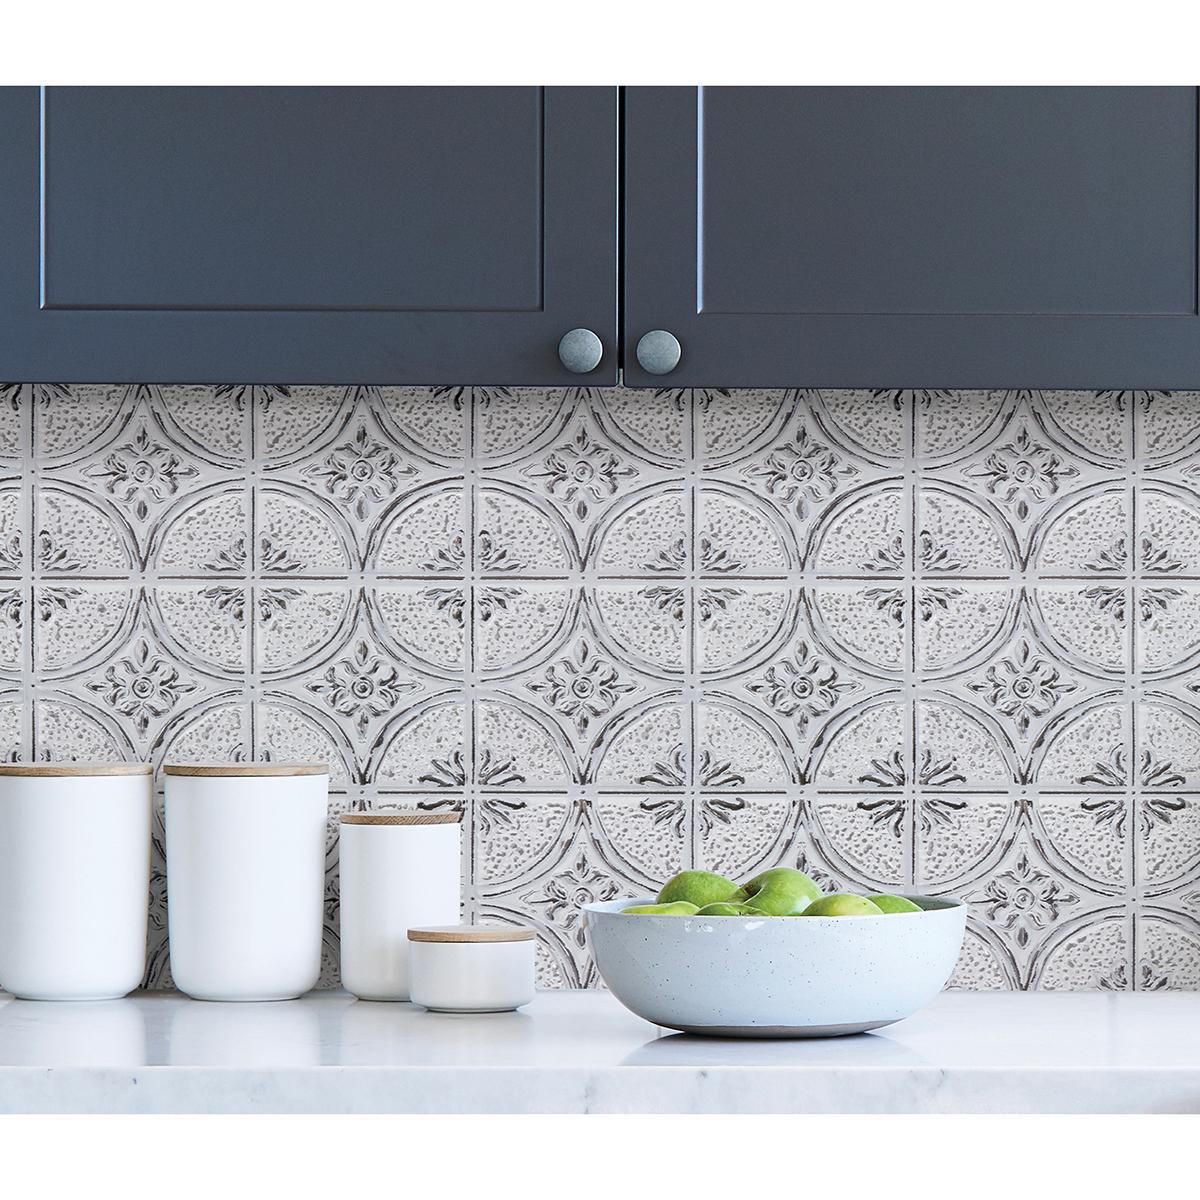 camden antique white faux tin peel and stick backsplash tiles